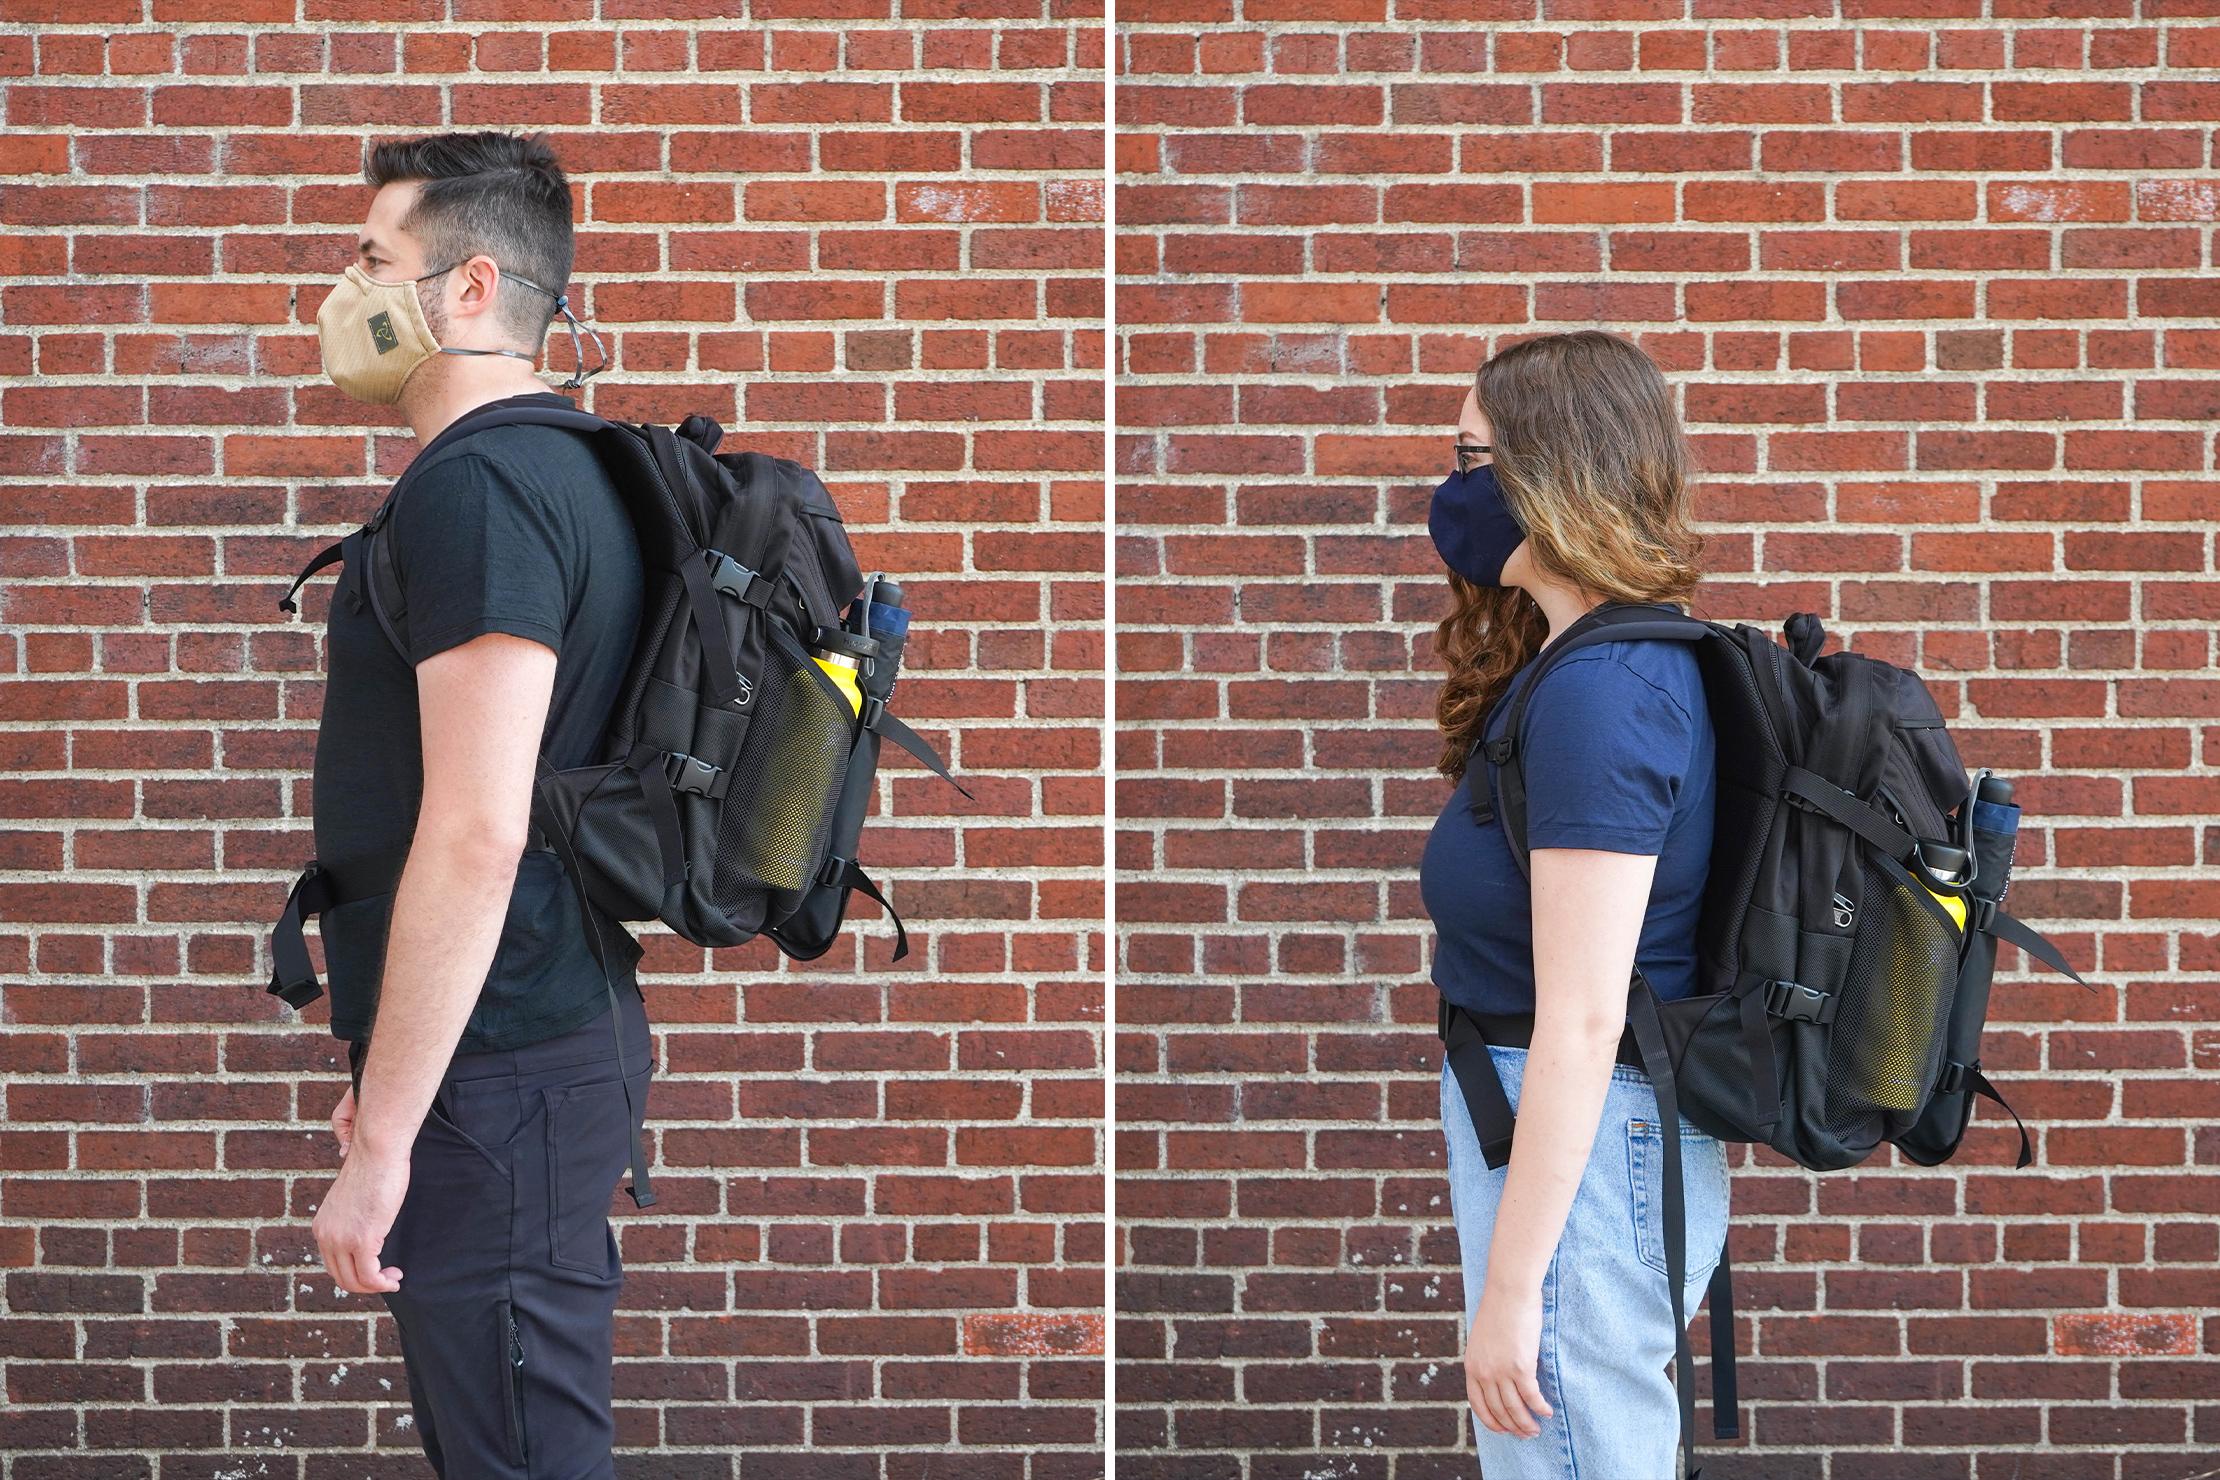 "Left: Tom, Height: 6'2"" (188 cm), Torso: 19.25"" (49 cm) | Right: Riley, Height: 5'4"" (162 cm), Torso: 16.5 in (42 cm)"